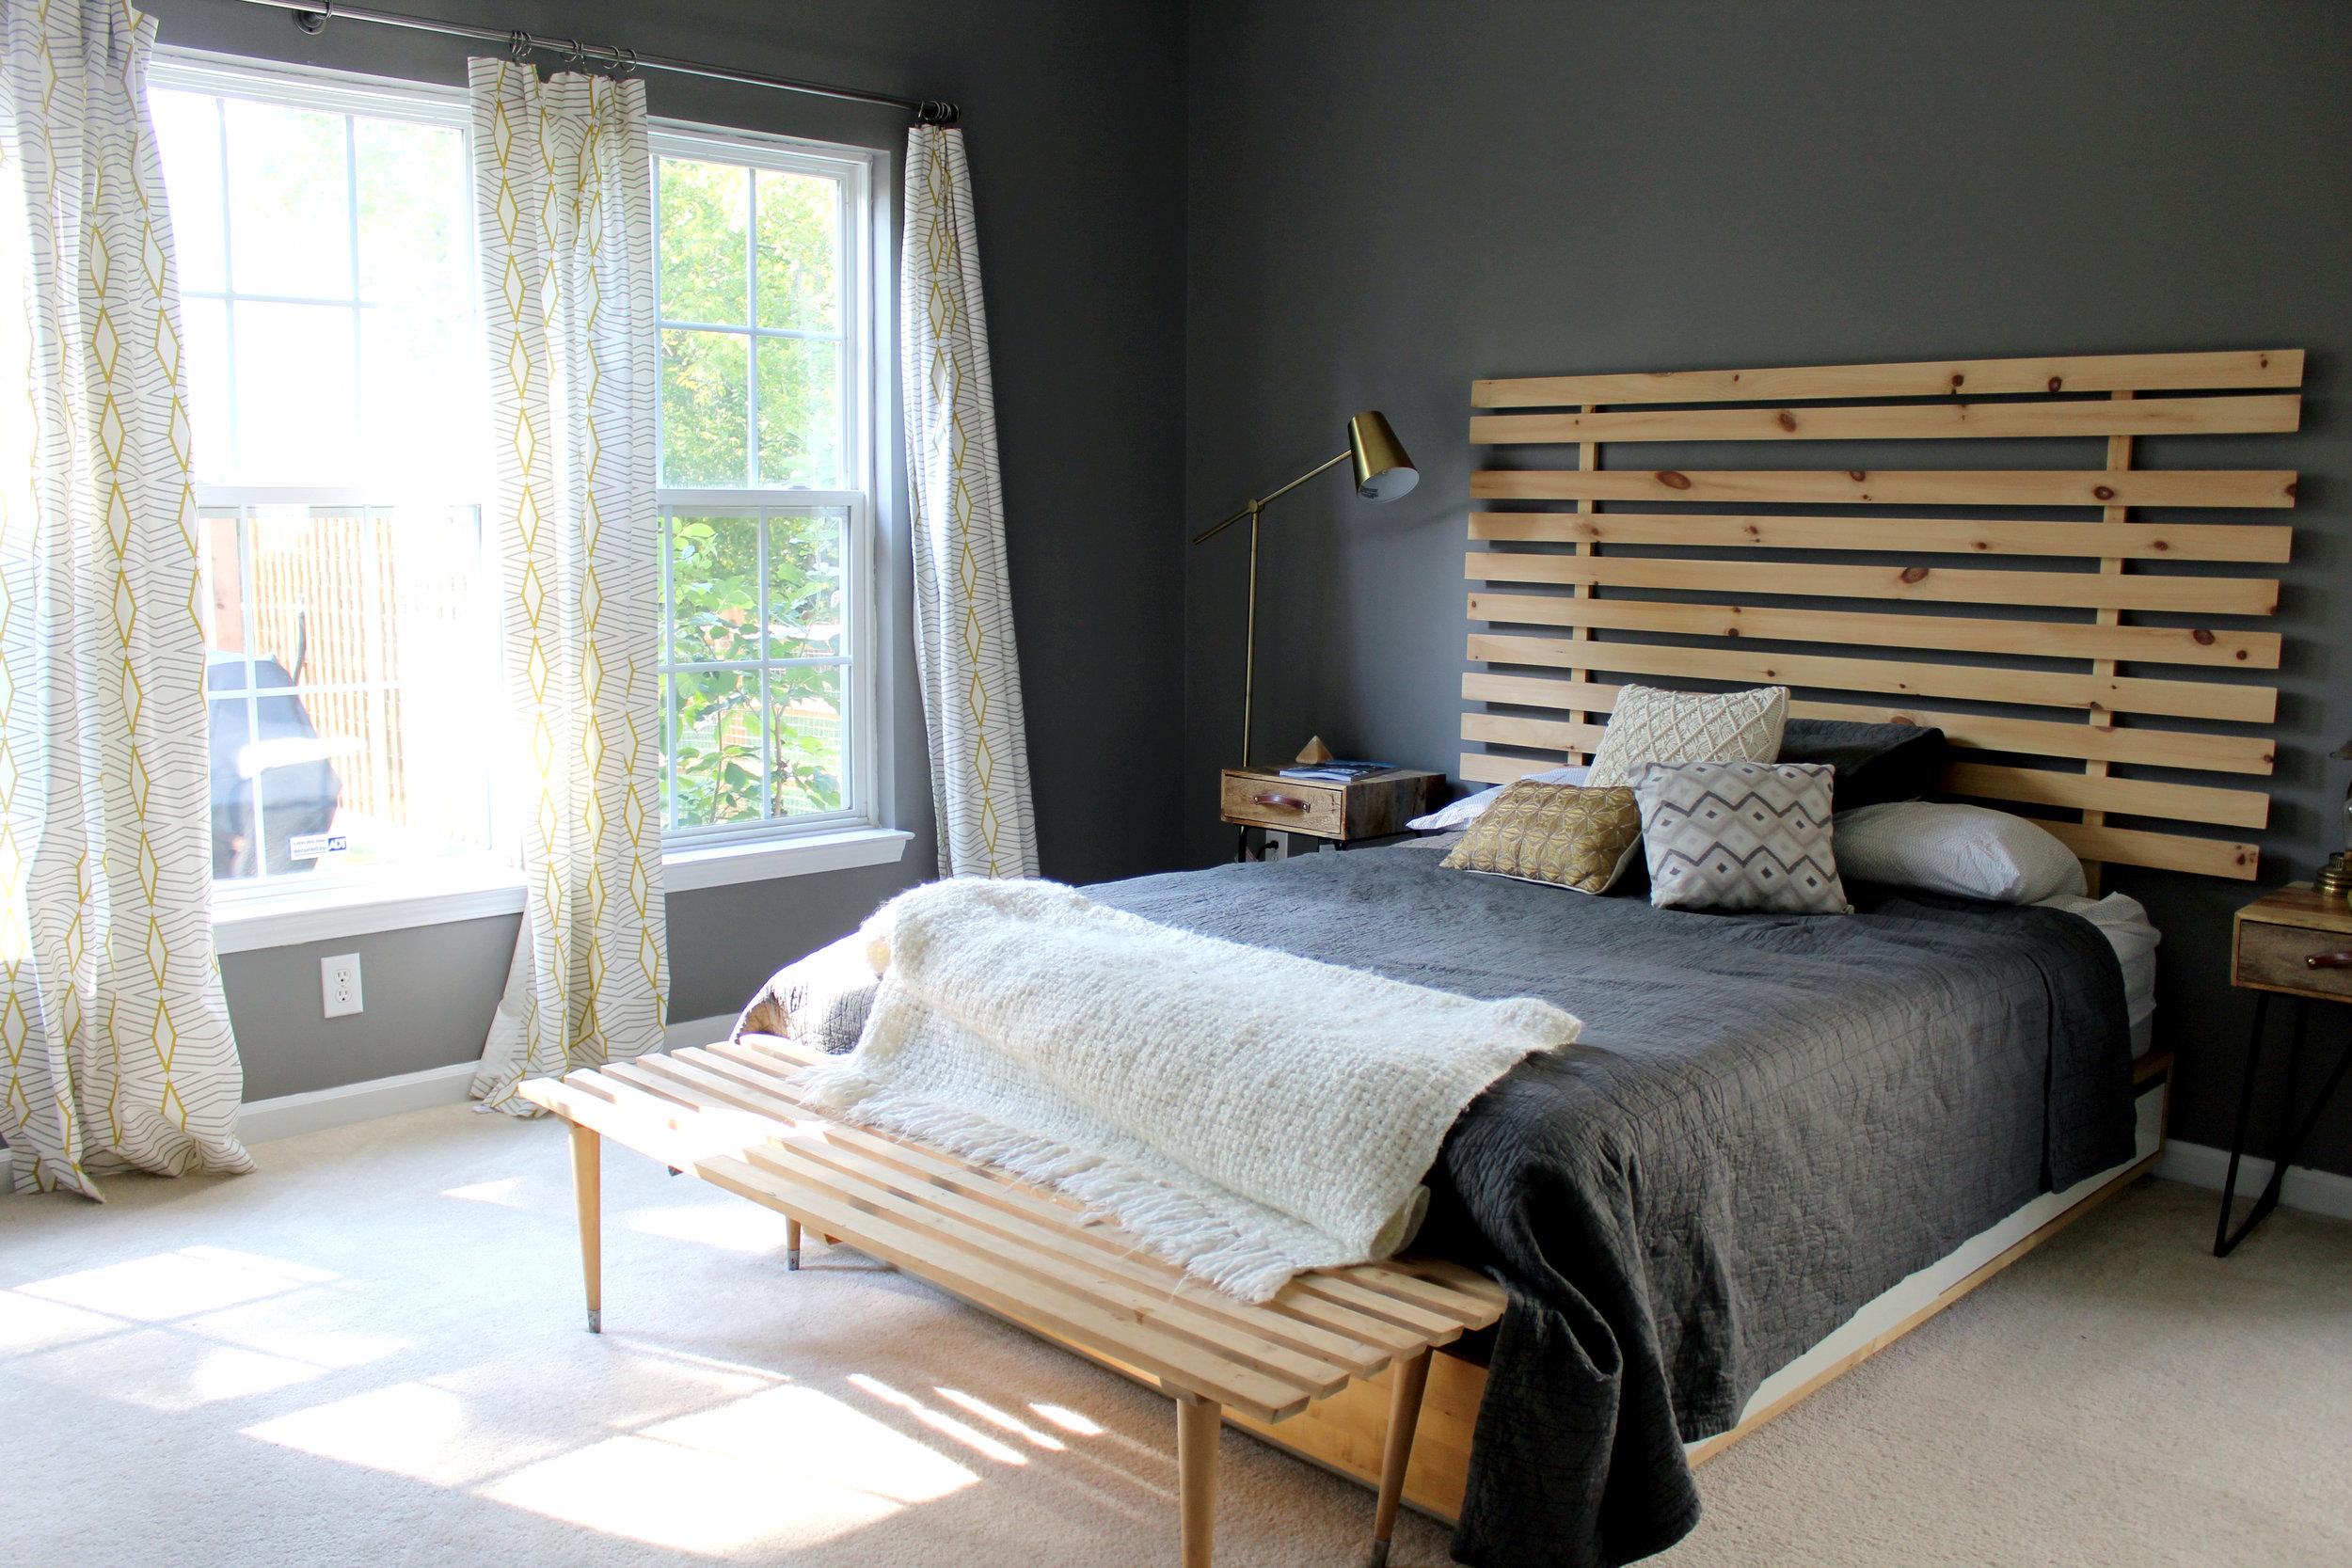 4 budget-friendly master bedroom decorating ideas